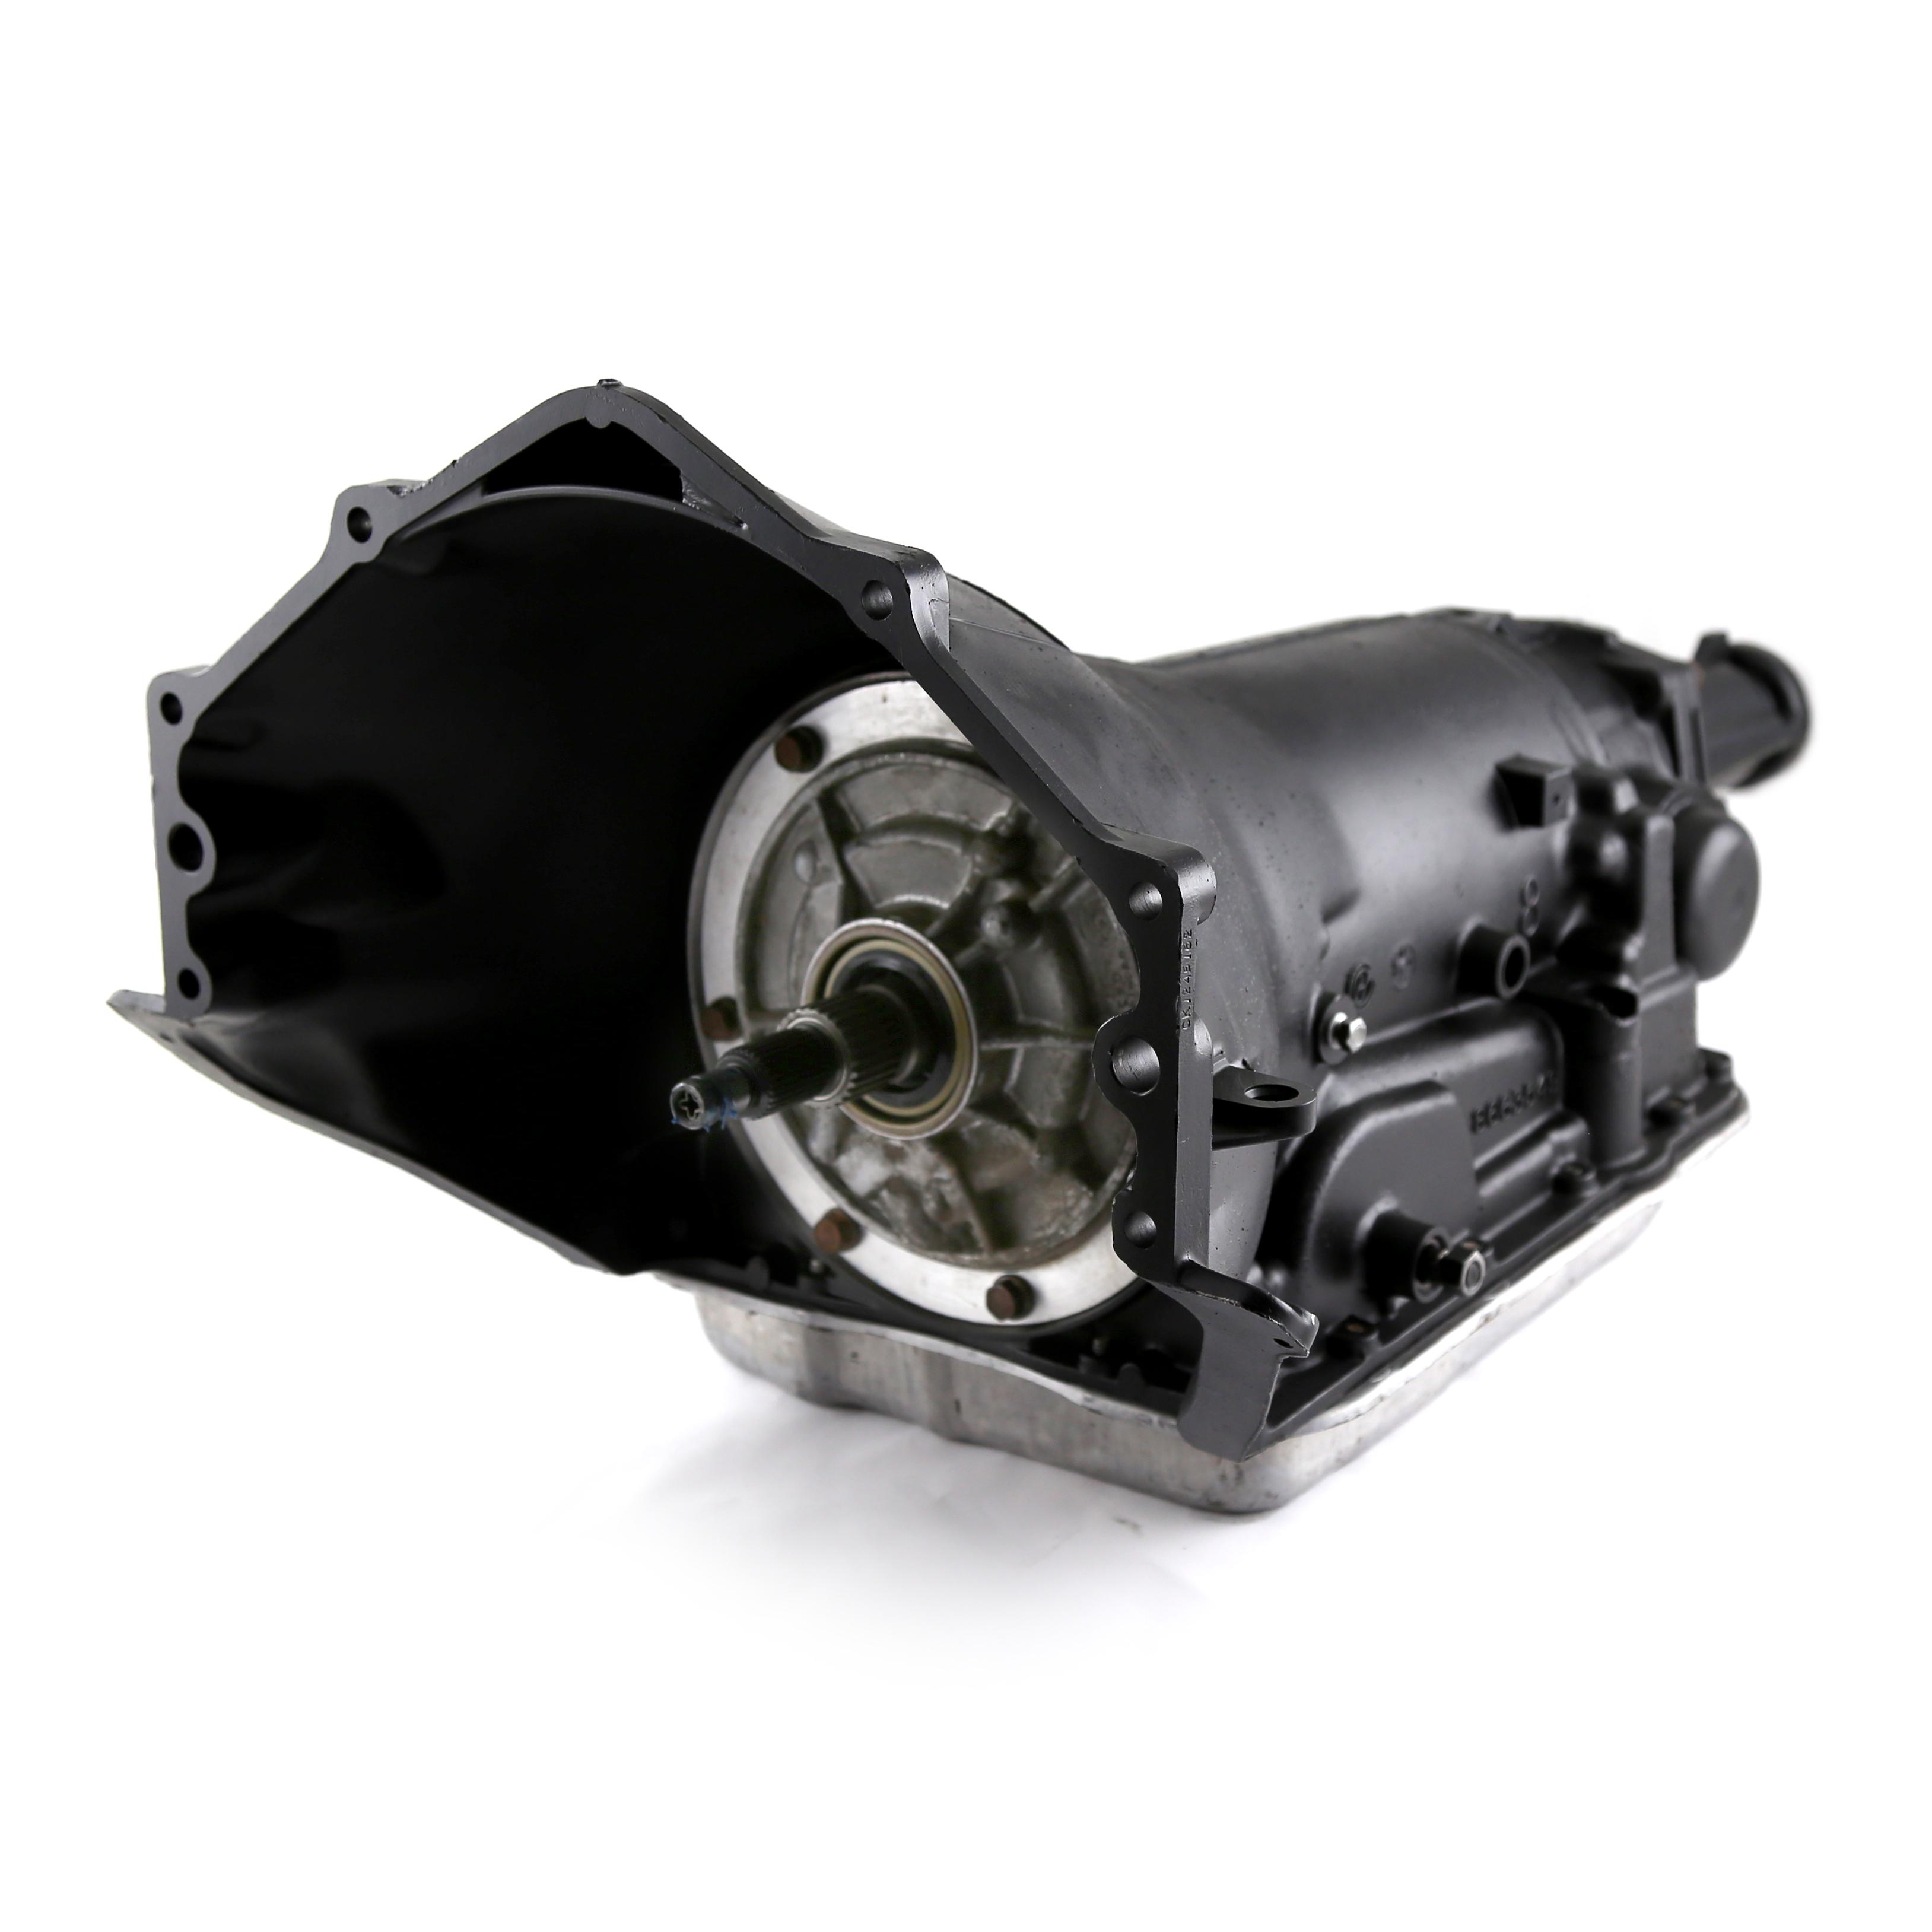 GM Powerglide Competition Rebuilt Transmission 1.76 Manual Valve Body